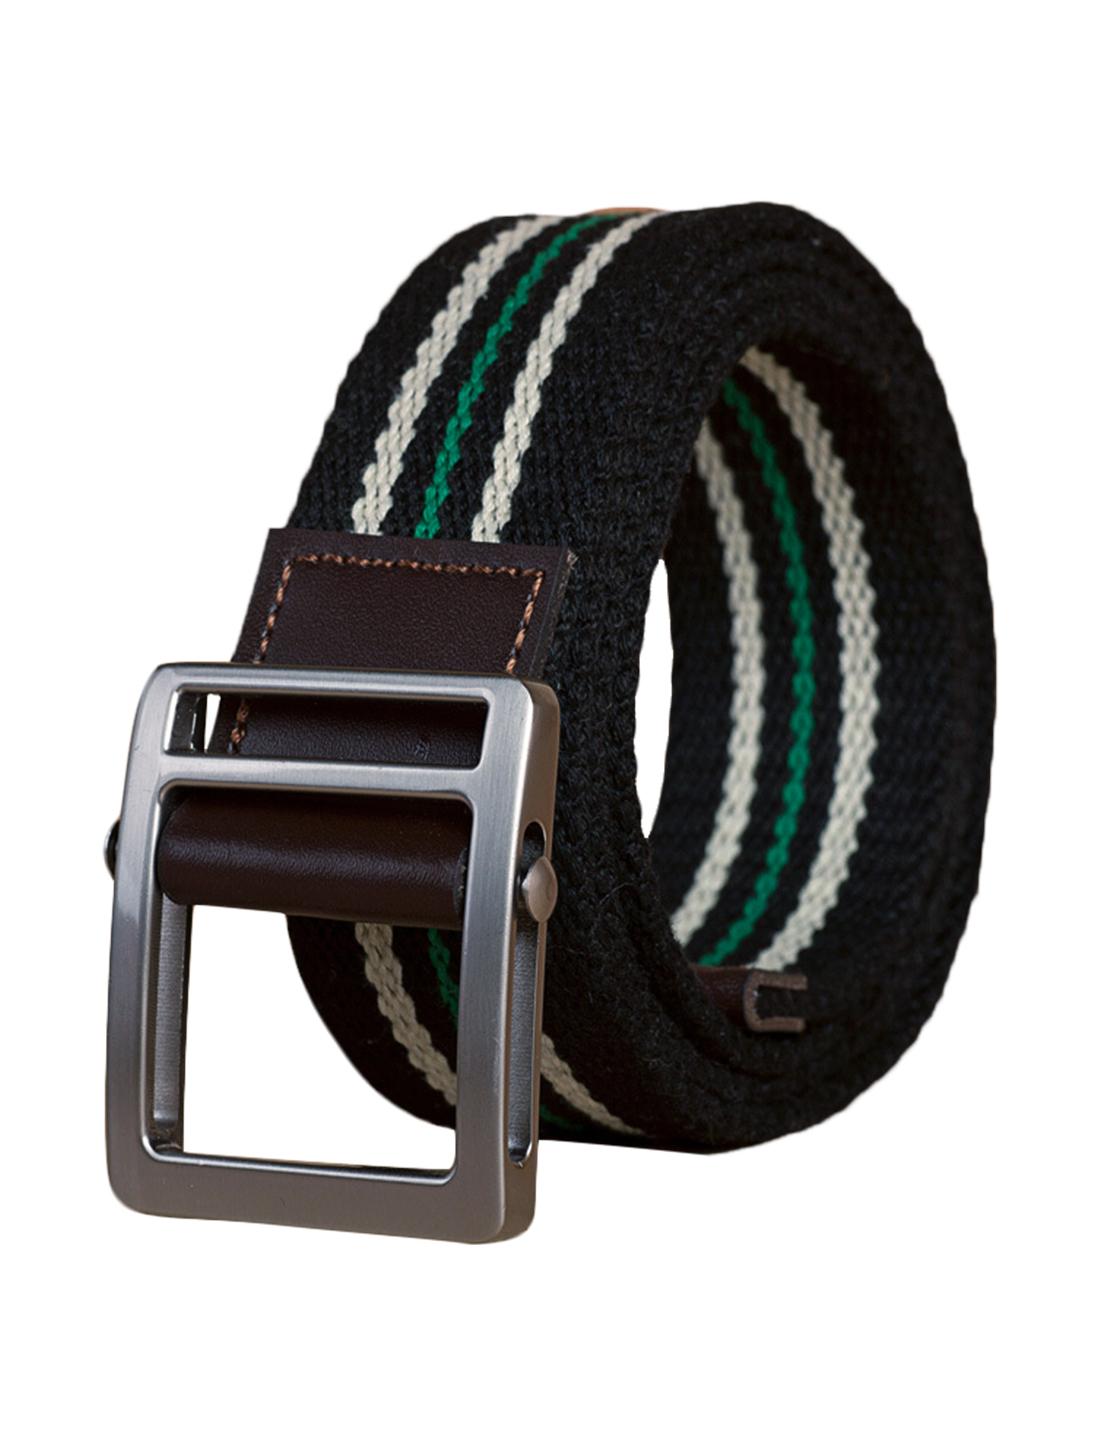 "Unisex Leather Paneled Striped Slide-buckle Belt Width 1 5/8"" Black"